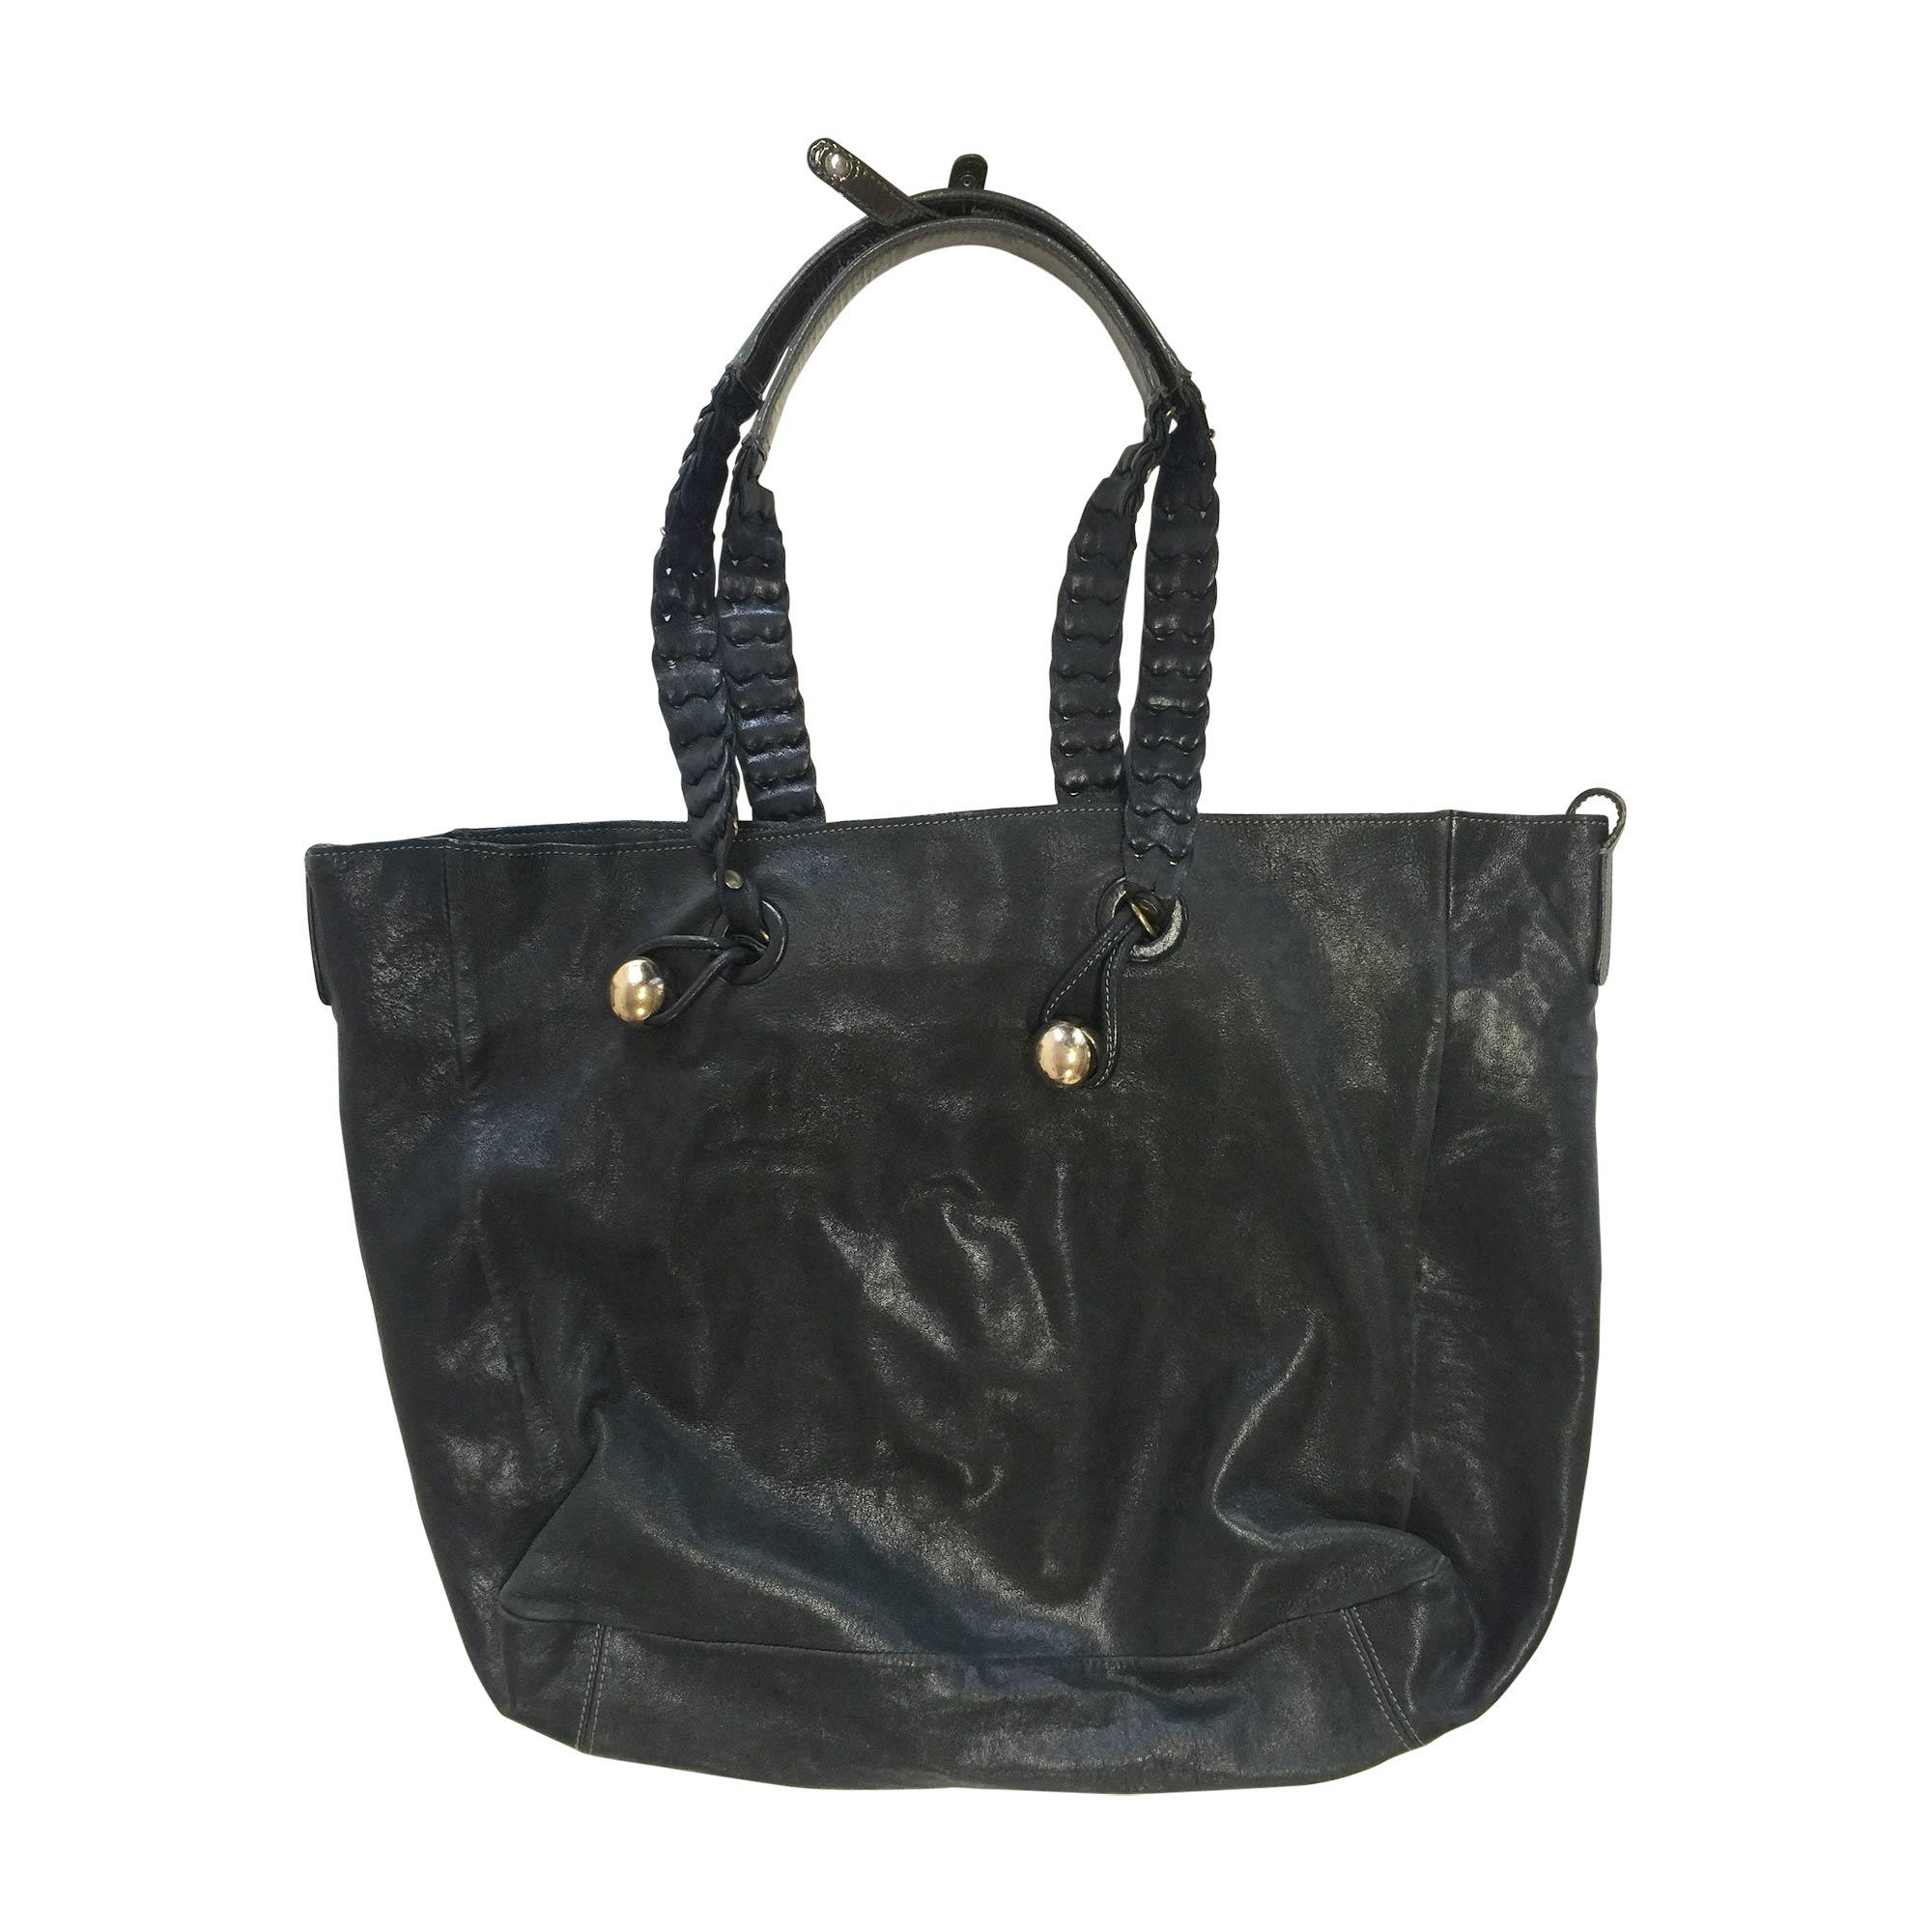 sac main en cuir chlo noir vendu par anna anna 4959037. Black Bedroom Furniture Sets. Home Design Ideas